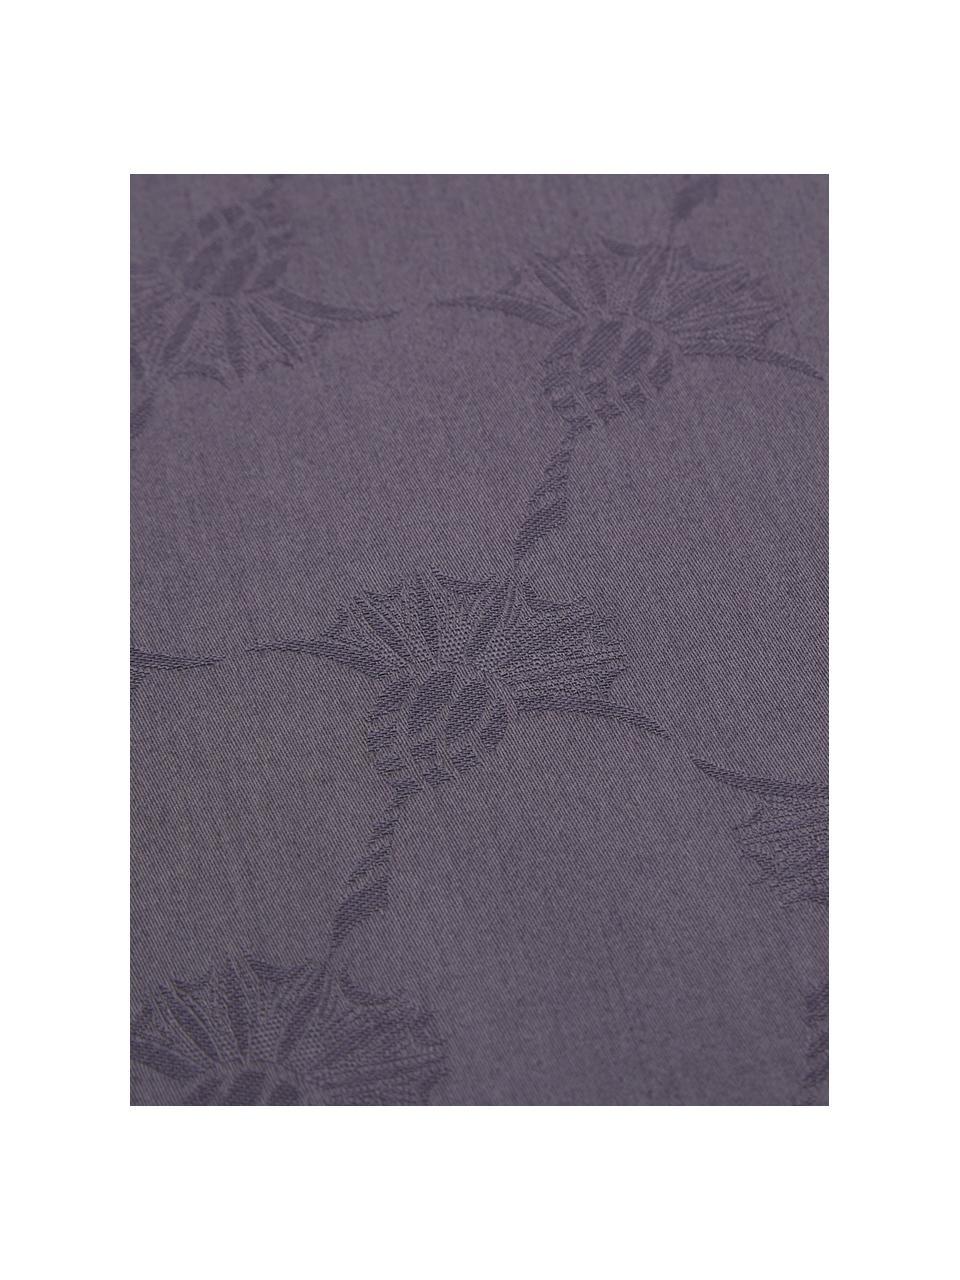 Mako-Satin-Bettwäsche Cornflower mit Kornblumen, Webart: Mako-Satin, Quarztöne, 135 x 200 cm + 1 Kissen 80 x 80 cm